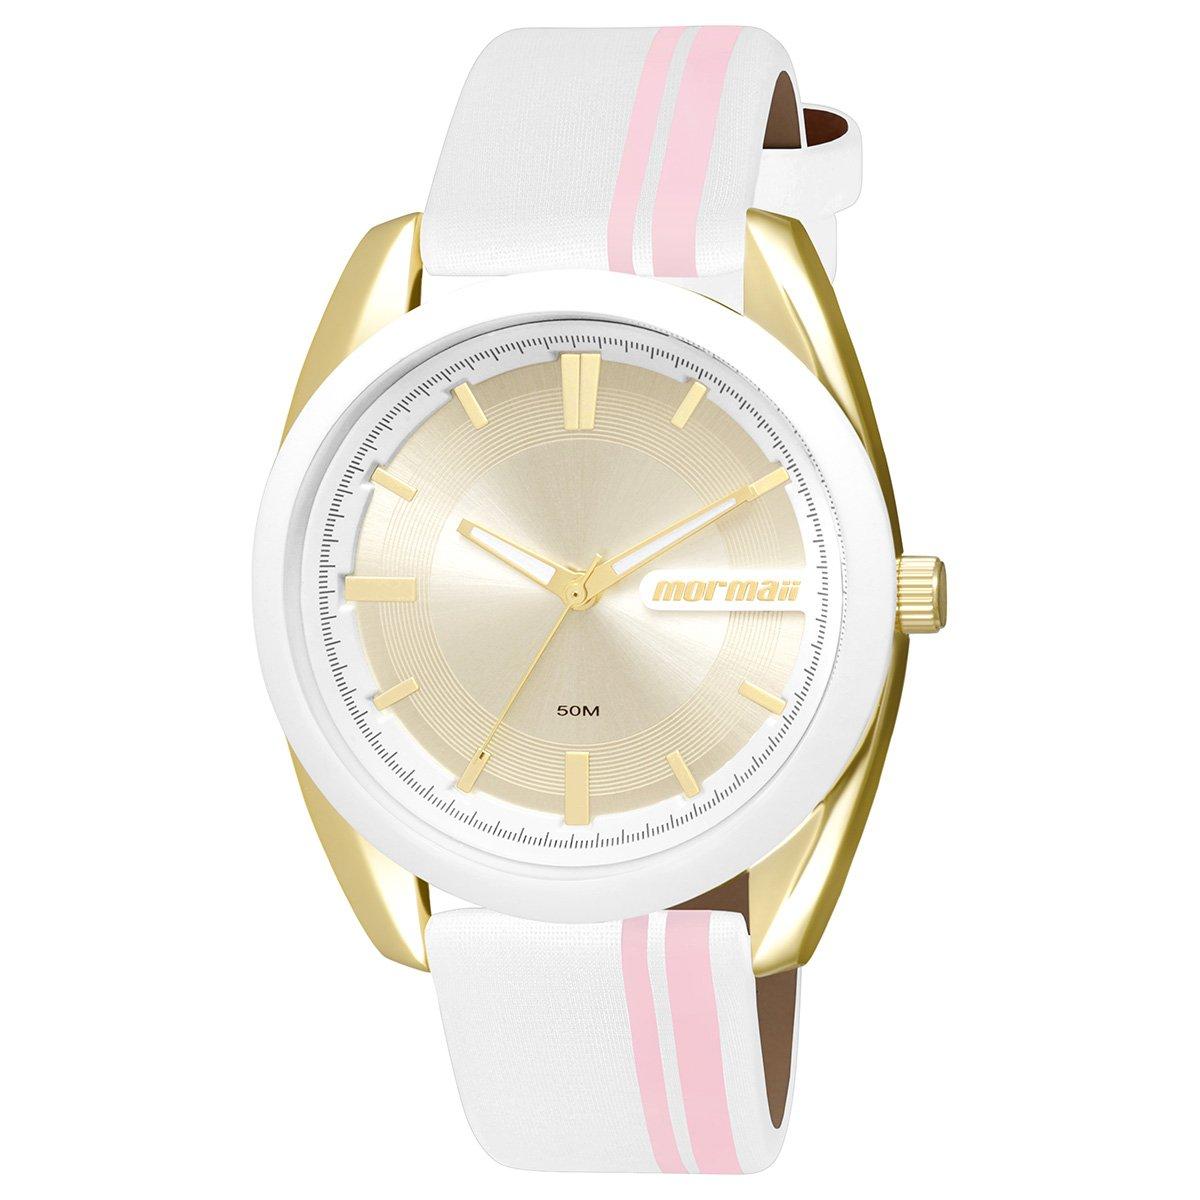 Relógio Mormaii Analógico MO2039AG-8K Feminino - Compre Agora   Netshoes 6651dd1fe5